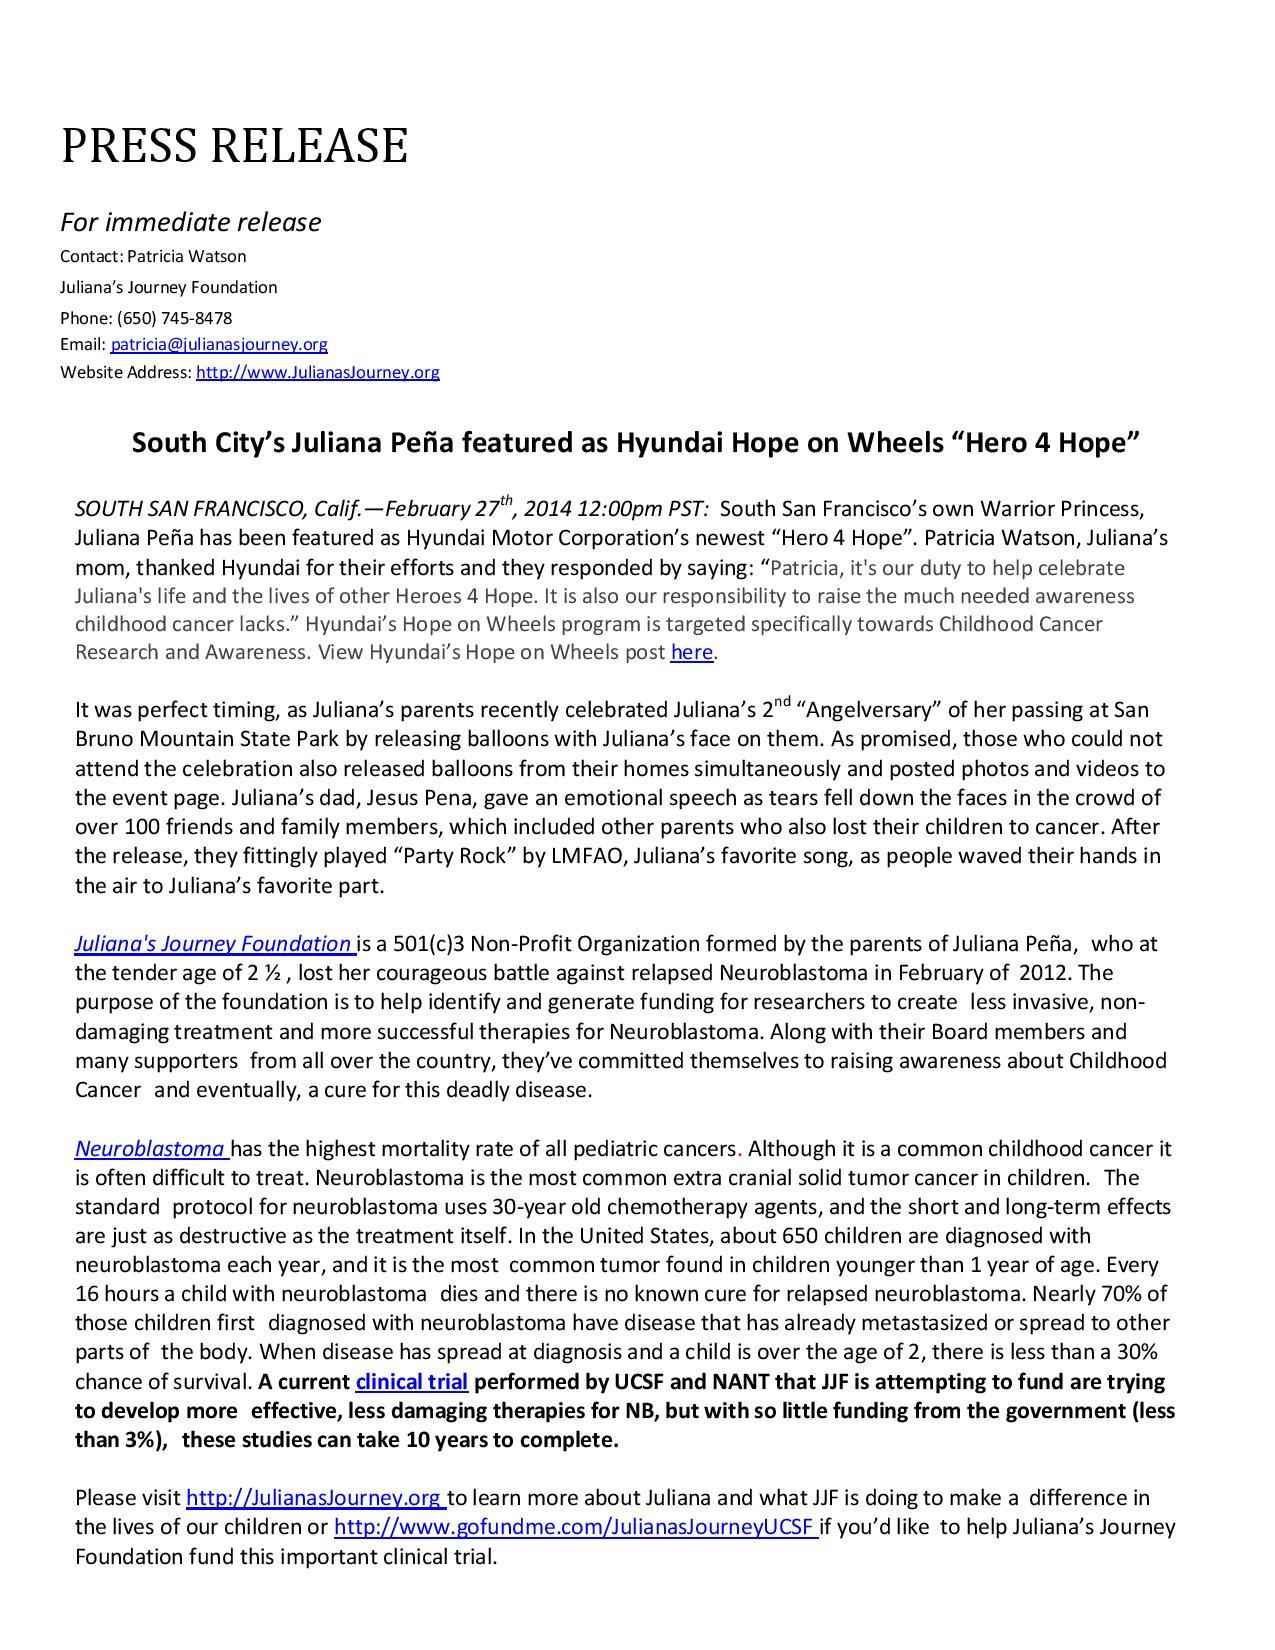 JJF PRESS RELEASE 2-27-14-page-001 Hyundai